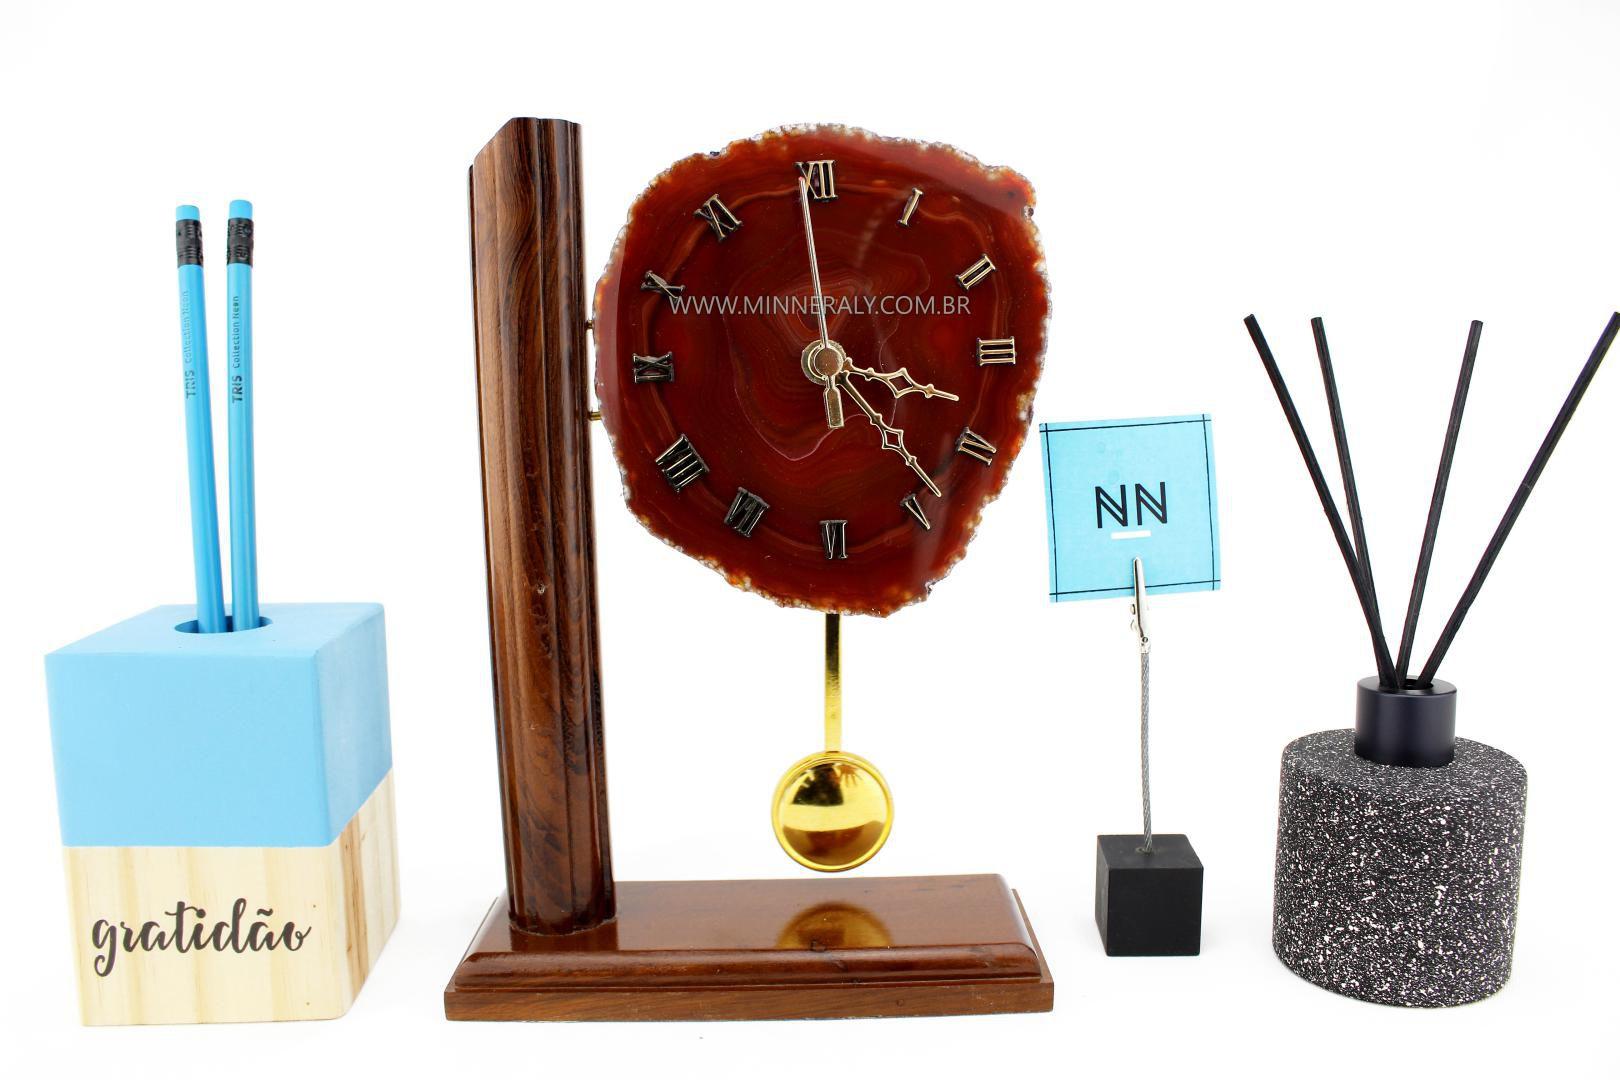 Relógio Chapa com Pêndulo em Ágata Marrom #NN102